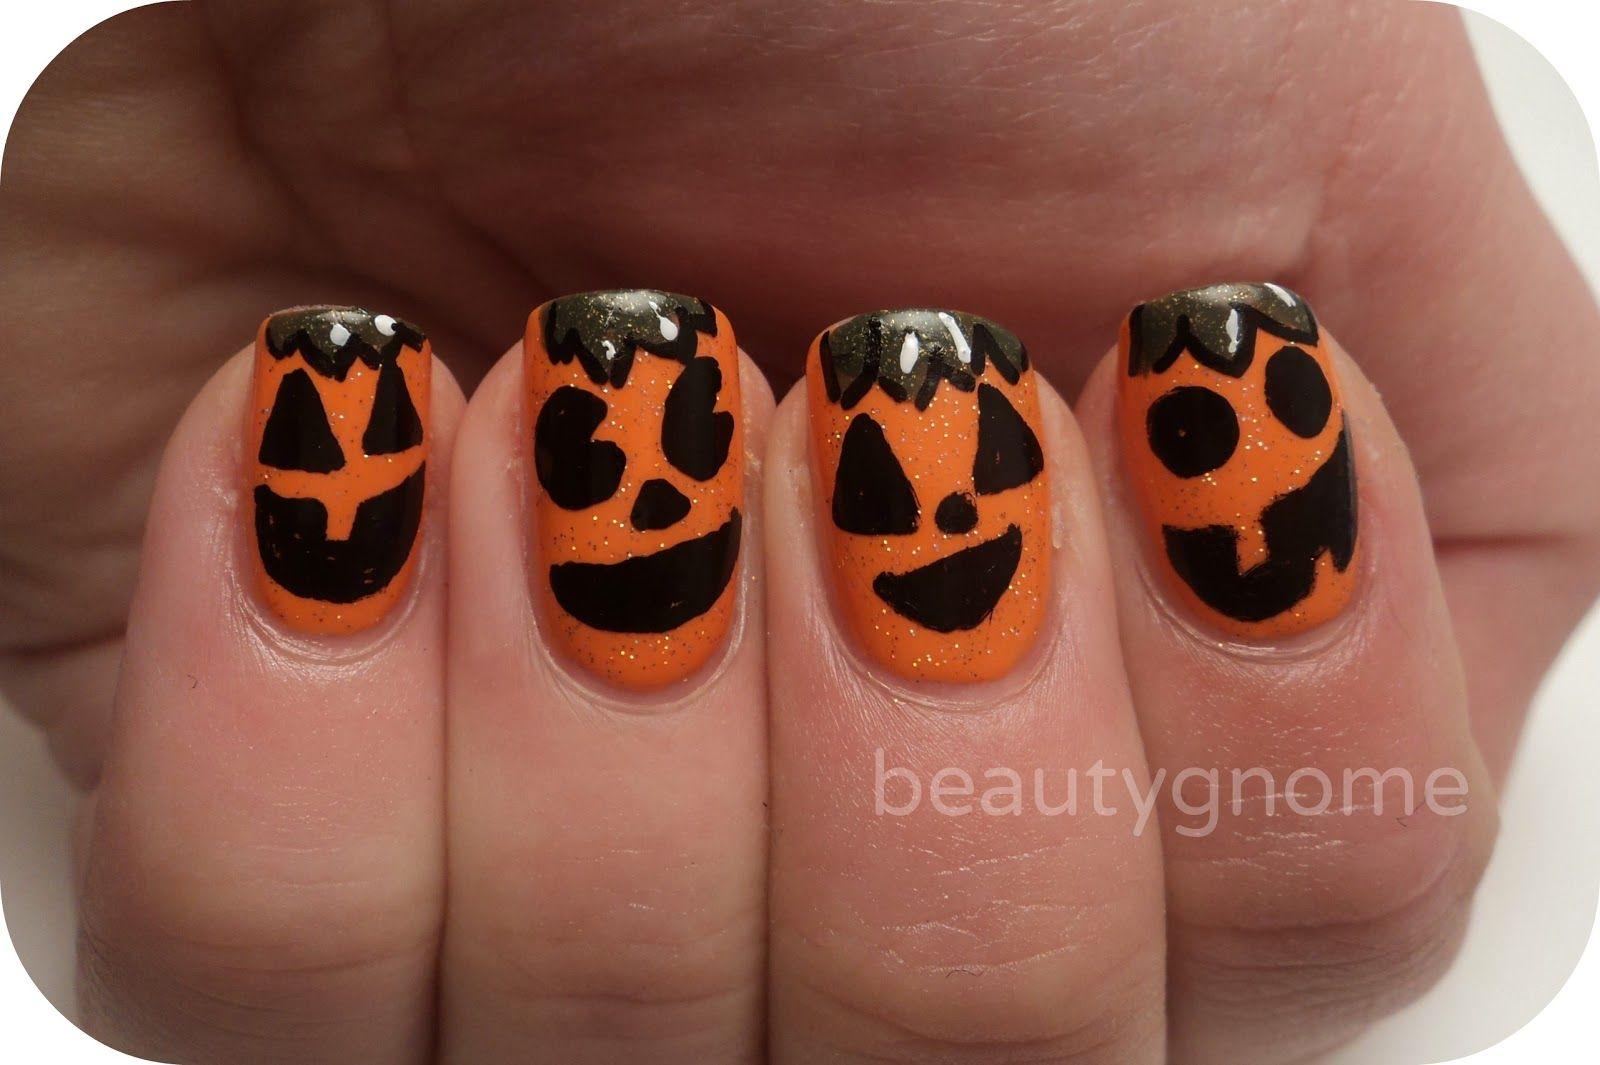 BeautyGnome: Jack-o-Lantern Nail Art featuring Zoya Nail Polish in ...